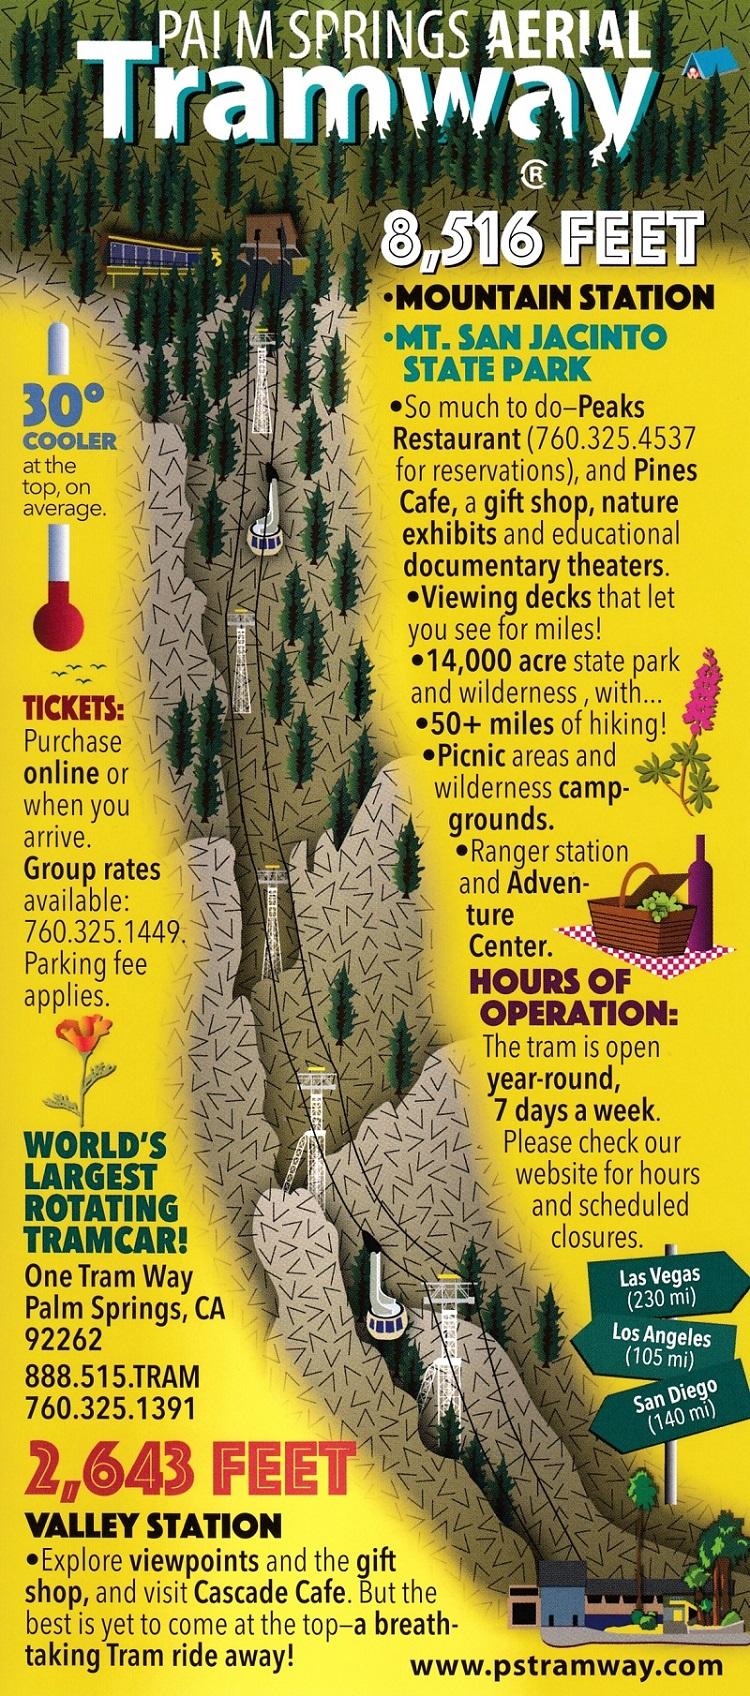 Palm Springs Aerial Tramway brochure thumbnail